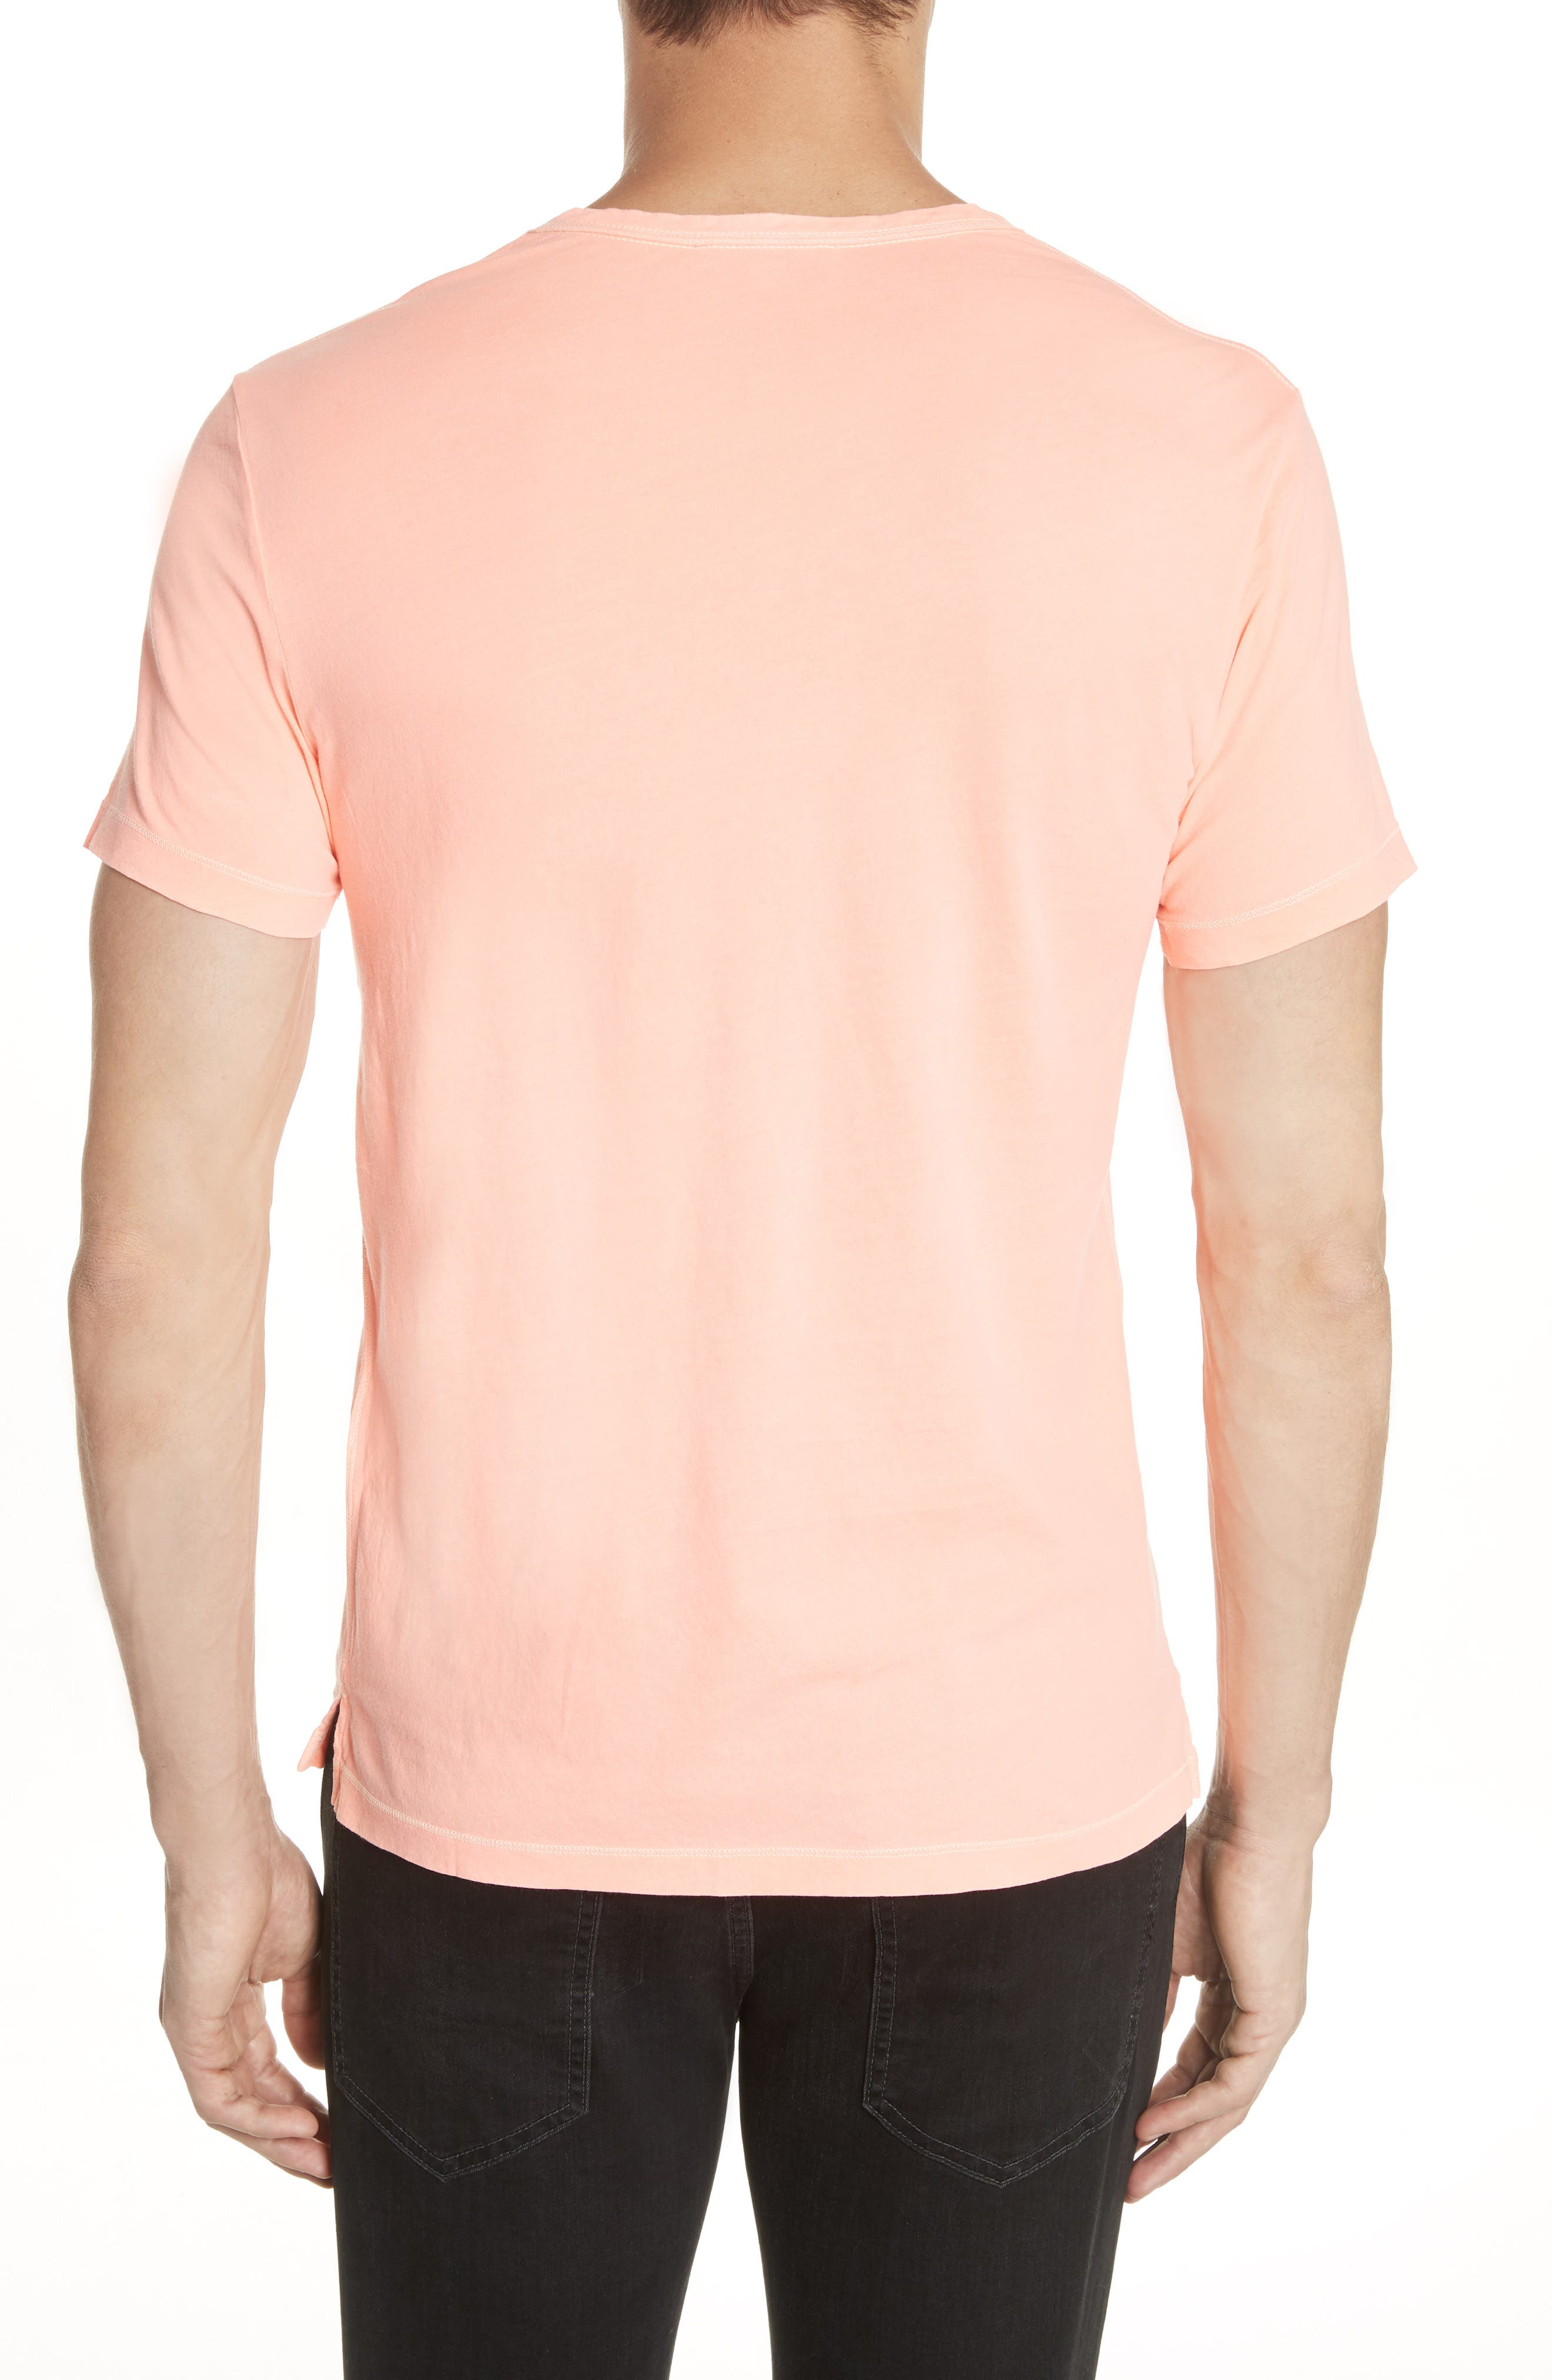 Rhine Graphic T-Shirt,                             Alternate thumbnail 2, color,                             800